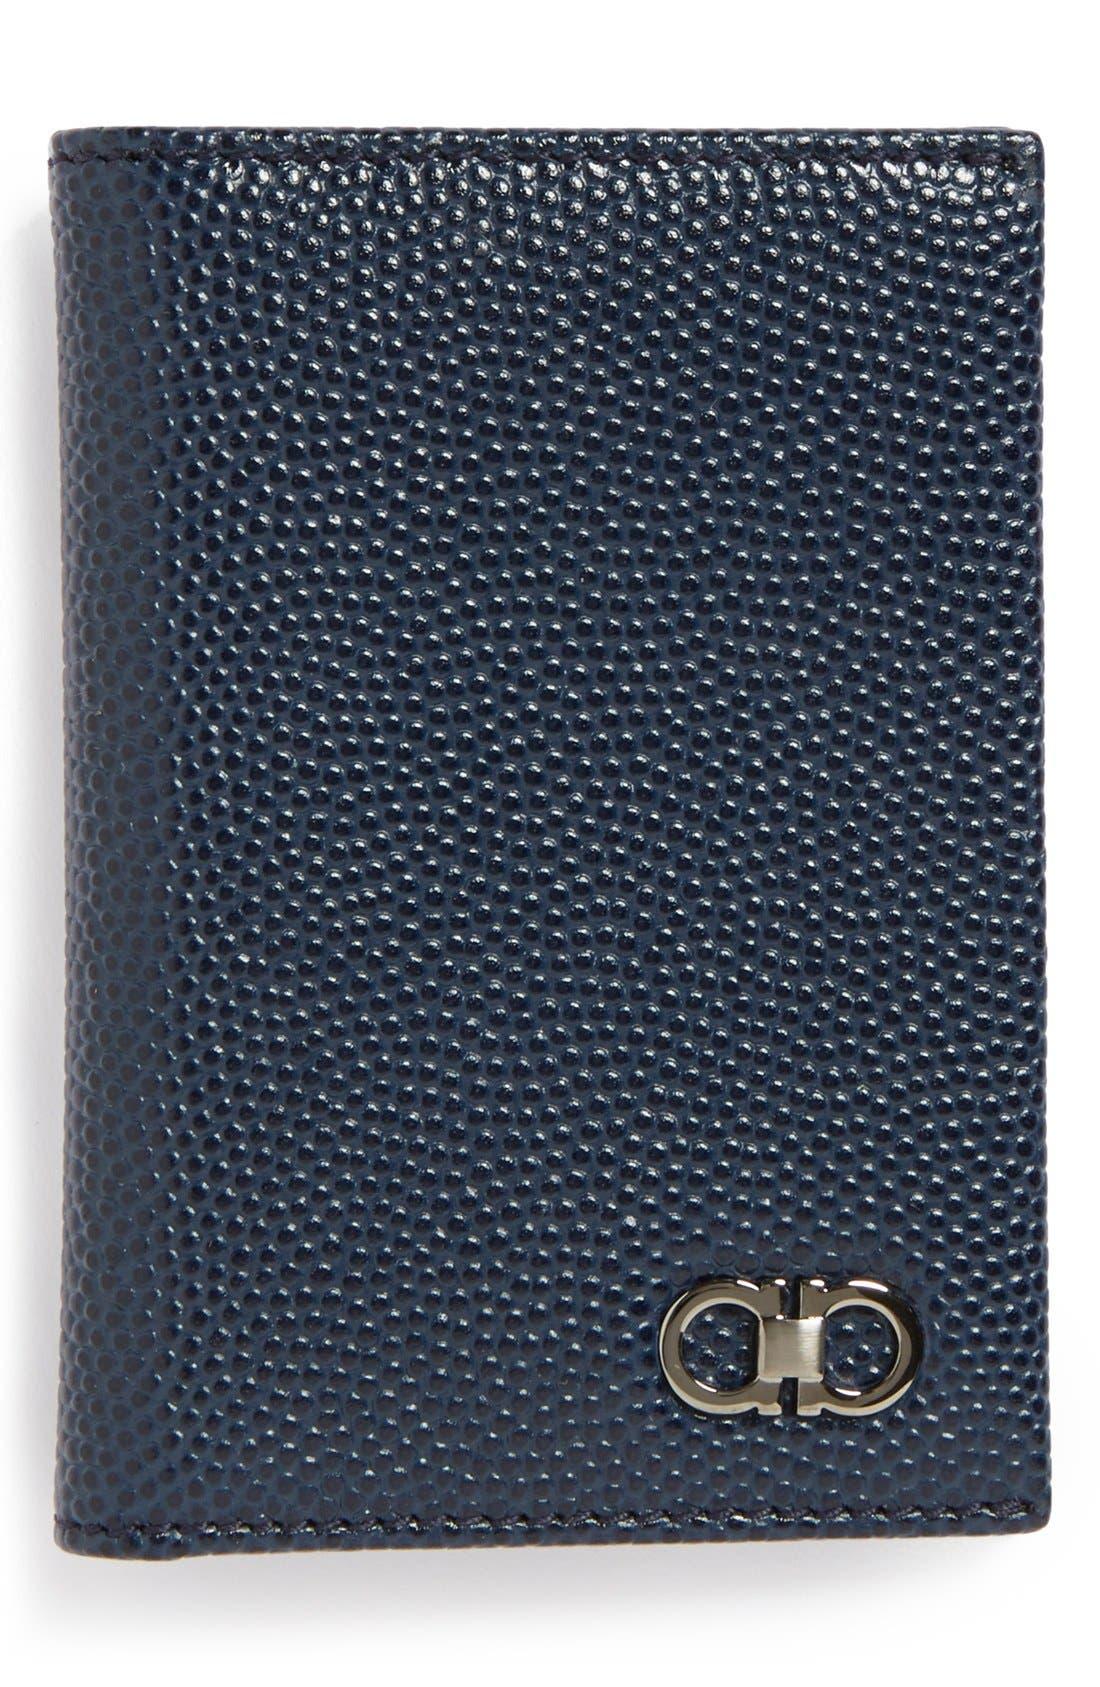 Main Image - Salvatore Ferragamo 'Ten Forty One' Leather Card Case